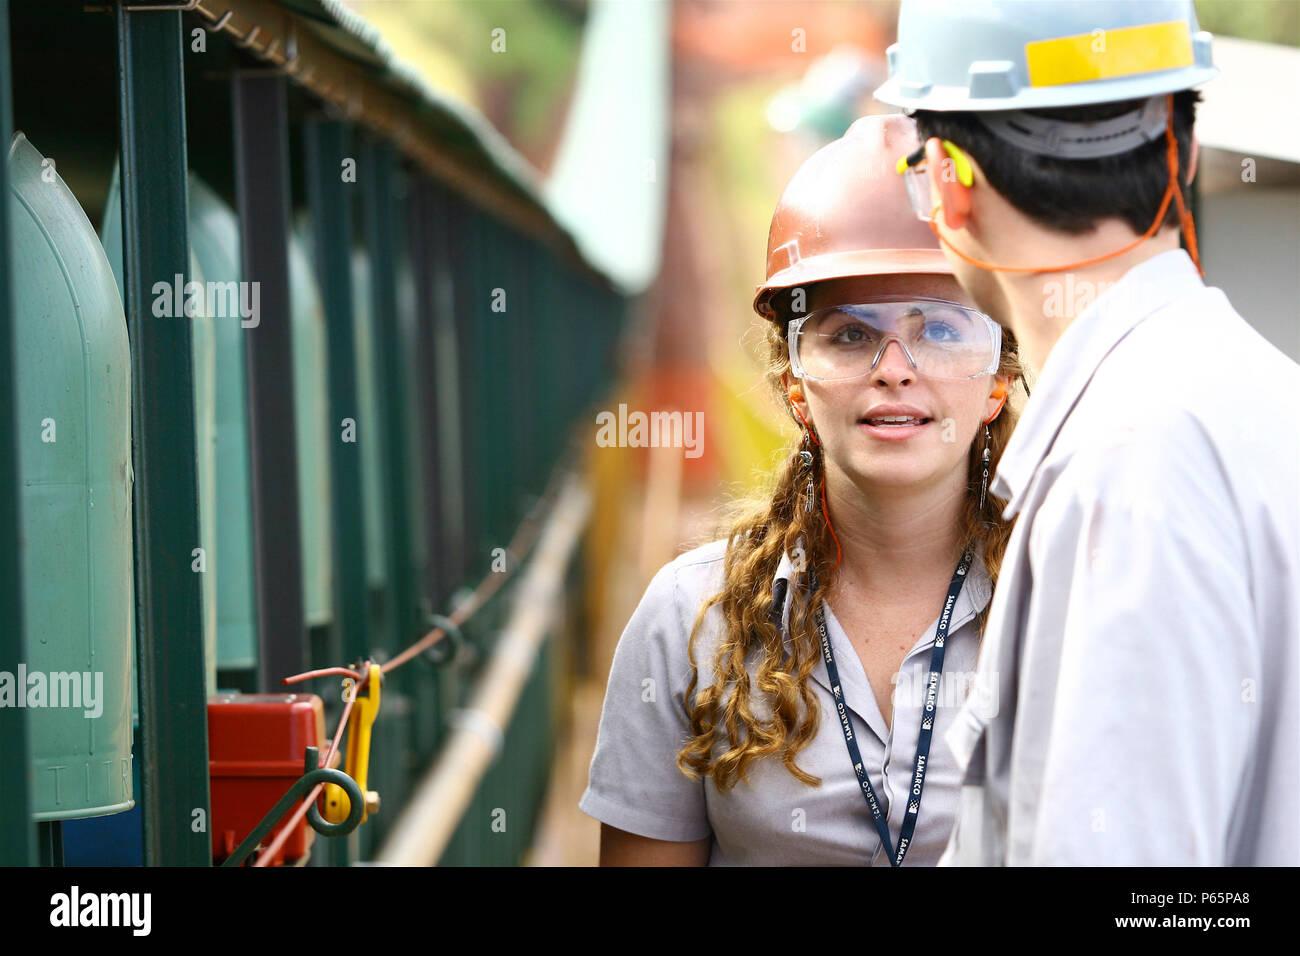 Iron Ore Production, State of Minas Gerais, Brazil - Stock Image